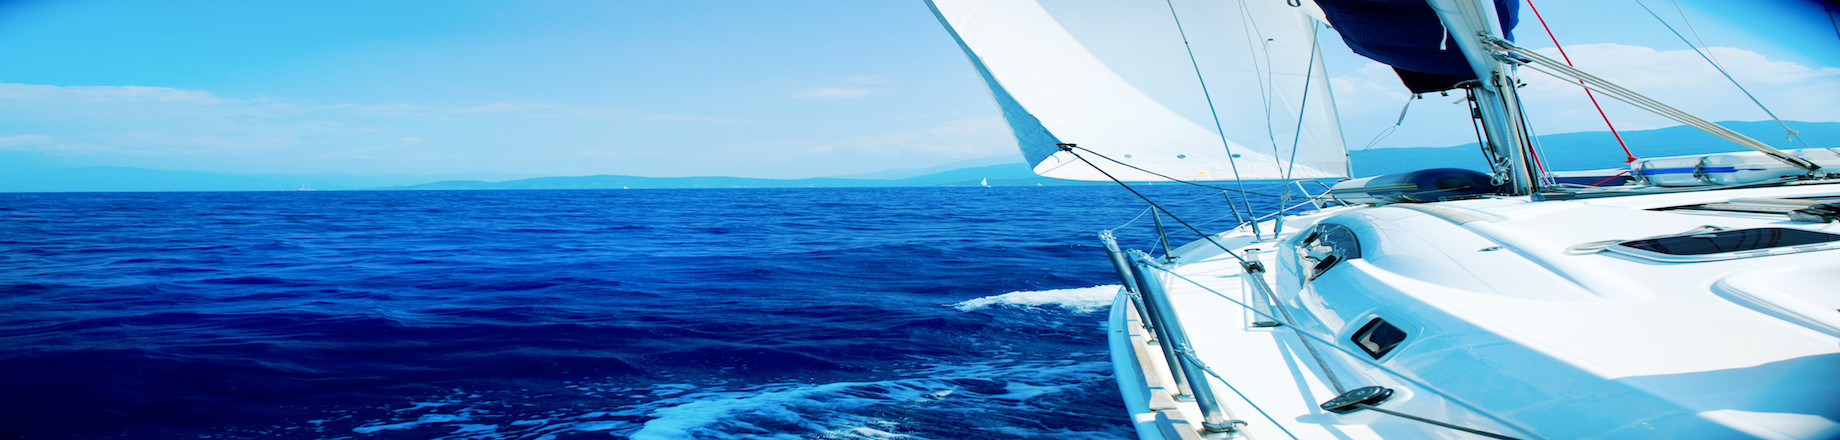 prepurchase boat inspection Houston